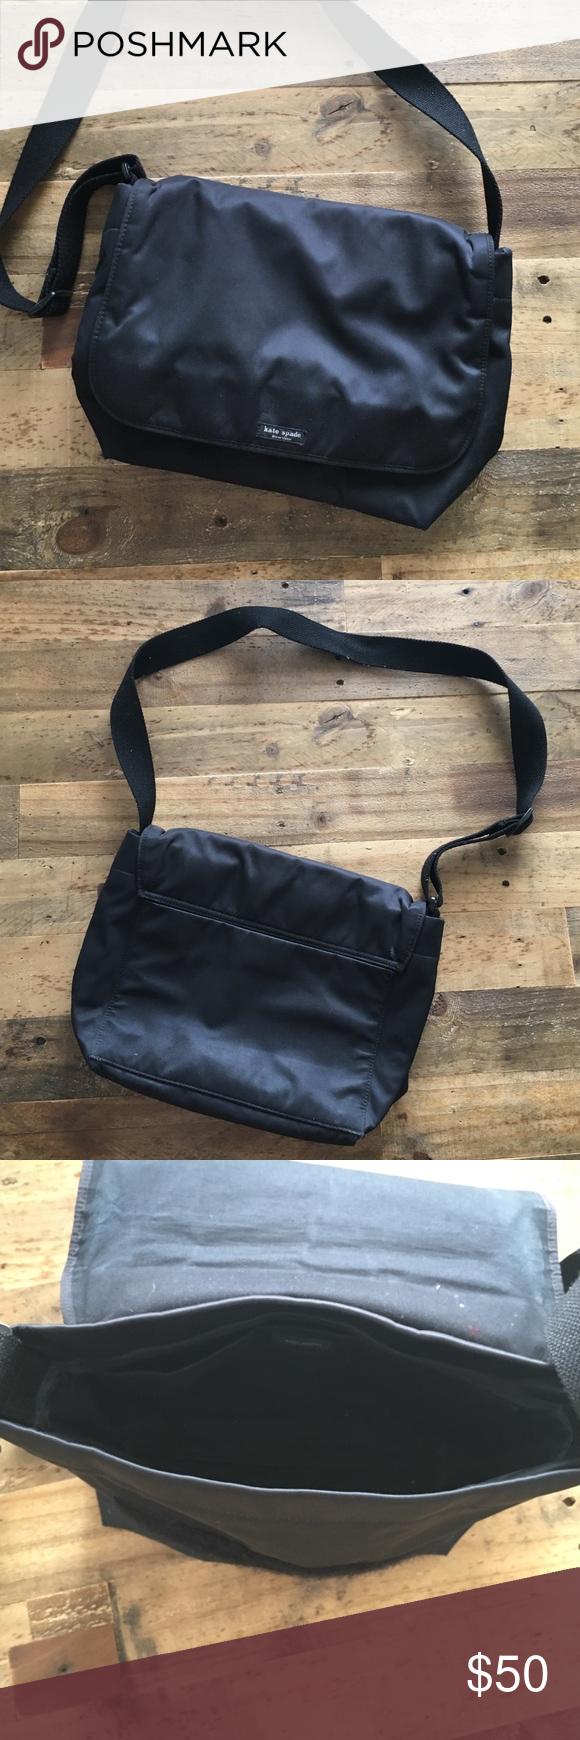 Kate spade black messenger bag Kate spade messenger bag. Nylon. Back and interior pockets. Velcro closing. Cross body strap. kate spade Bags Crossbody Bags